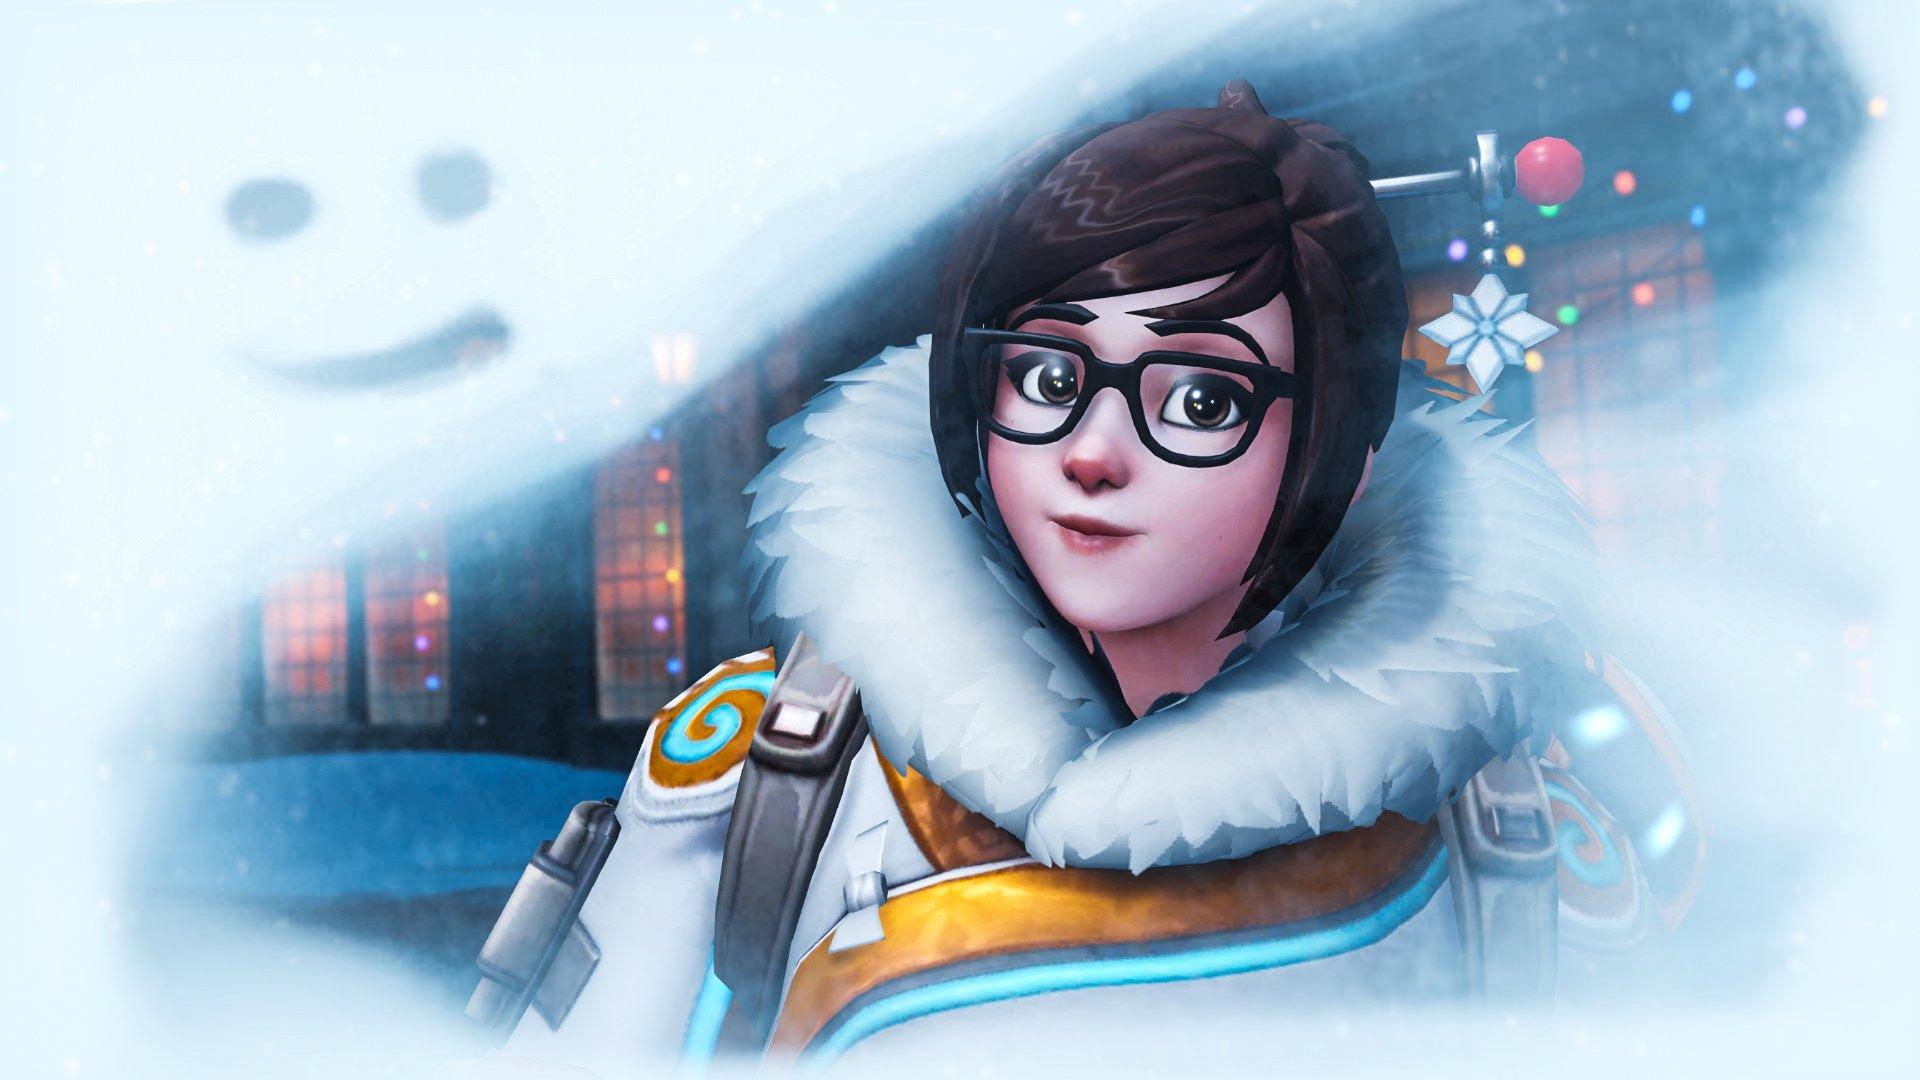 Overwatch Dual Screen Wallpaper: Background Image